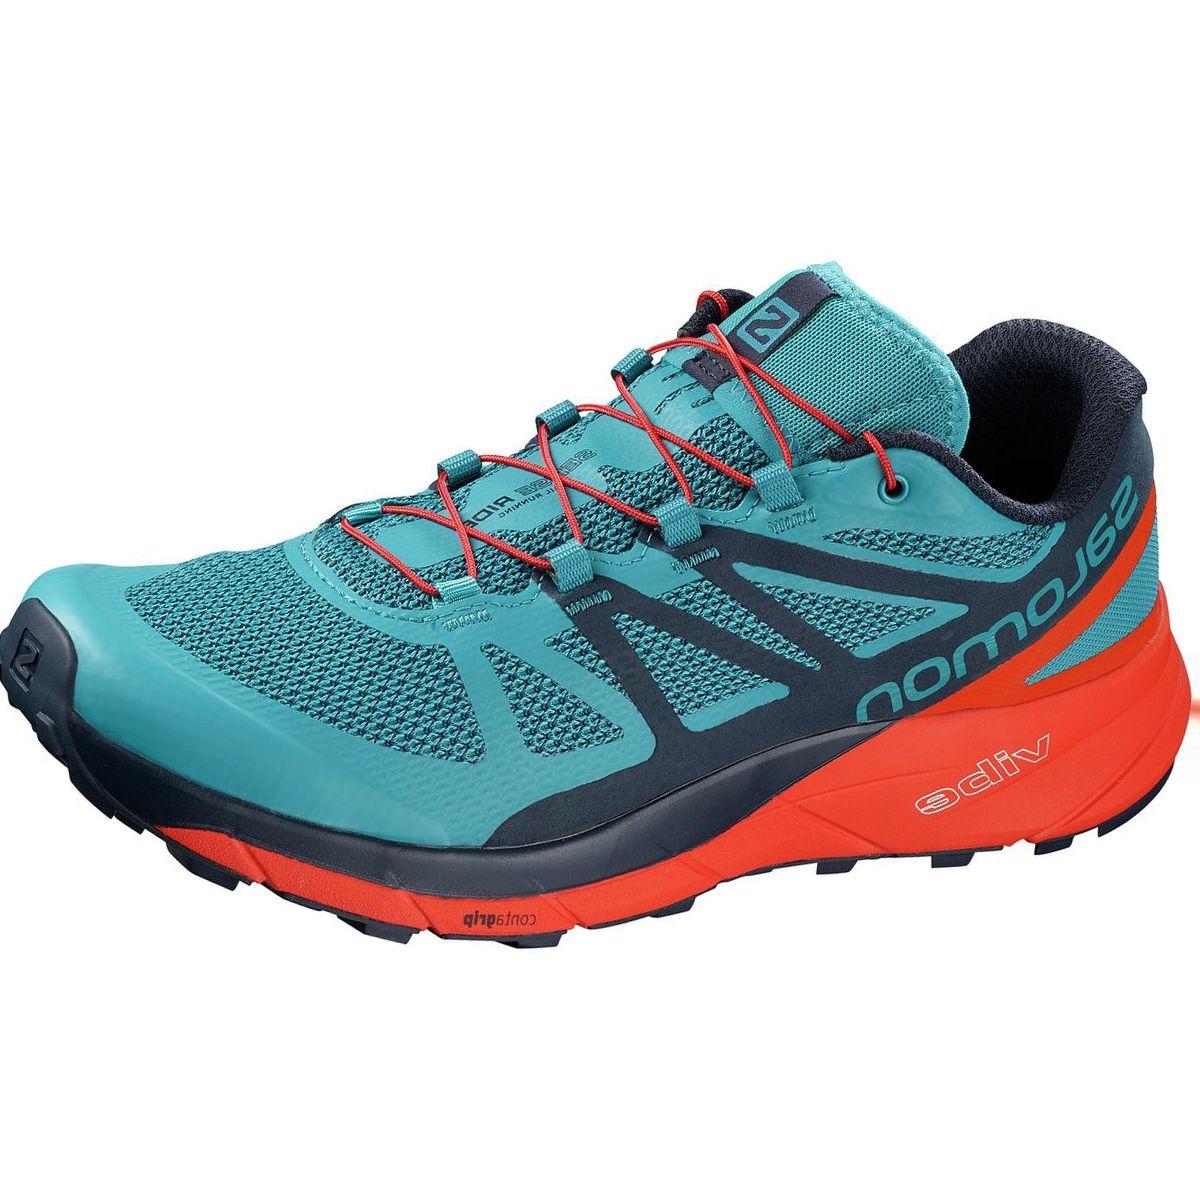 Salomon Sense Ride Trail Running Shoe - Men's